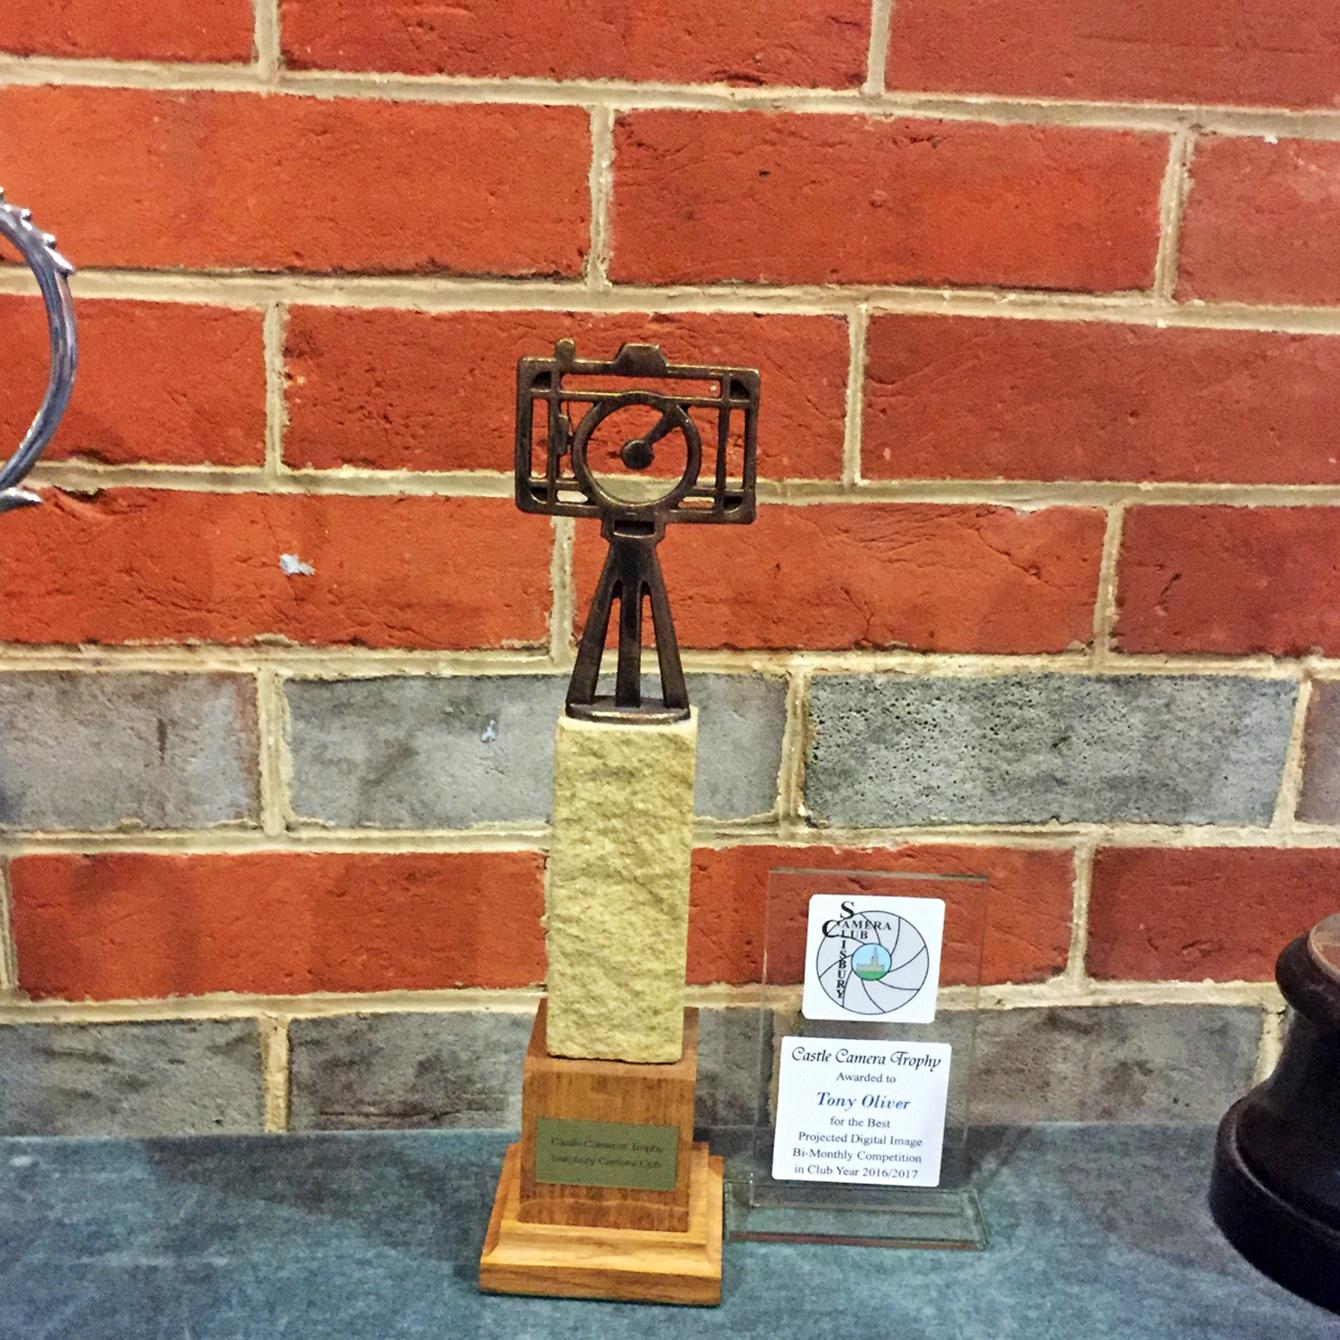 Castle Camera Trophy Winner Tony Oliver